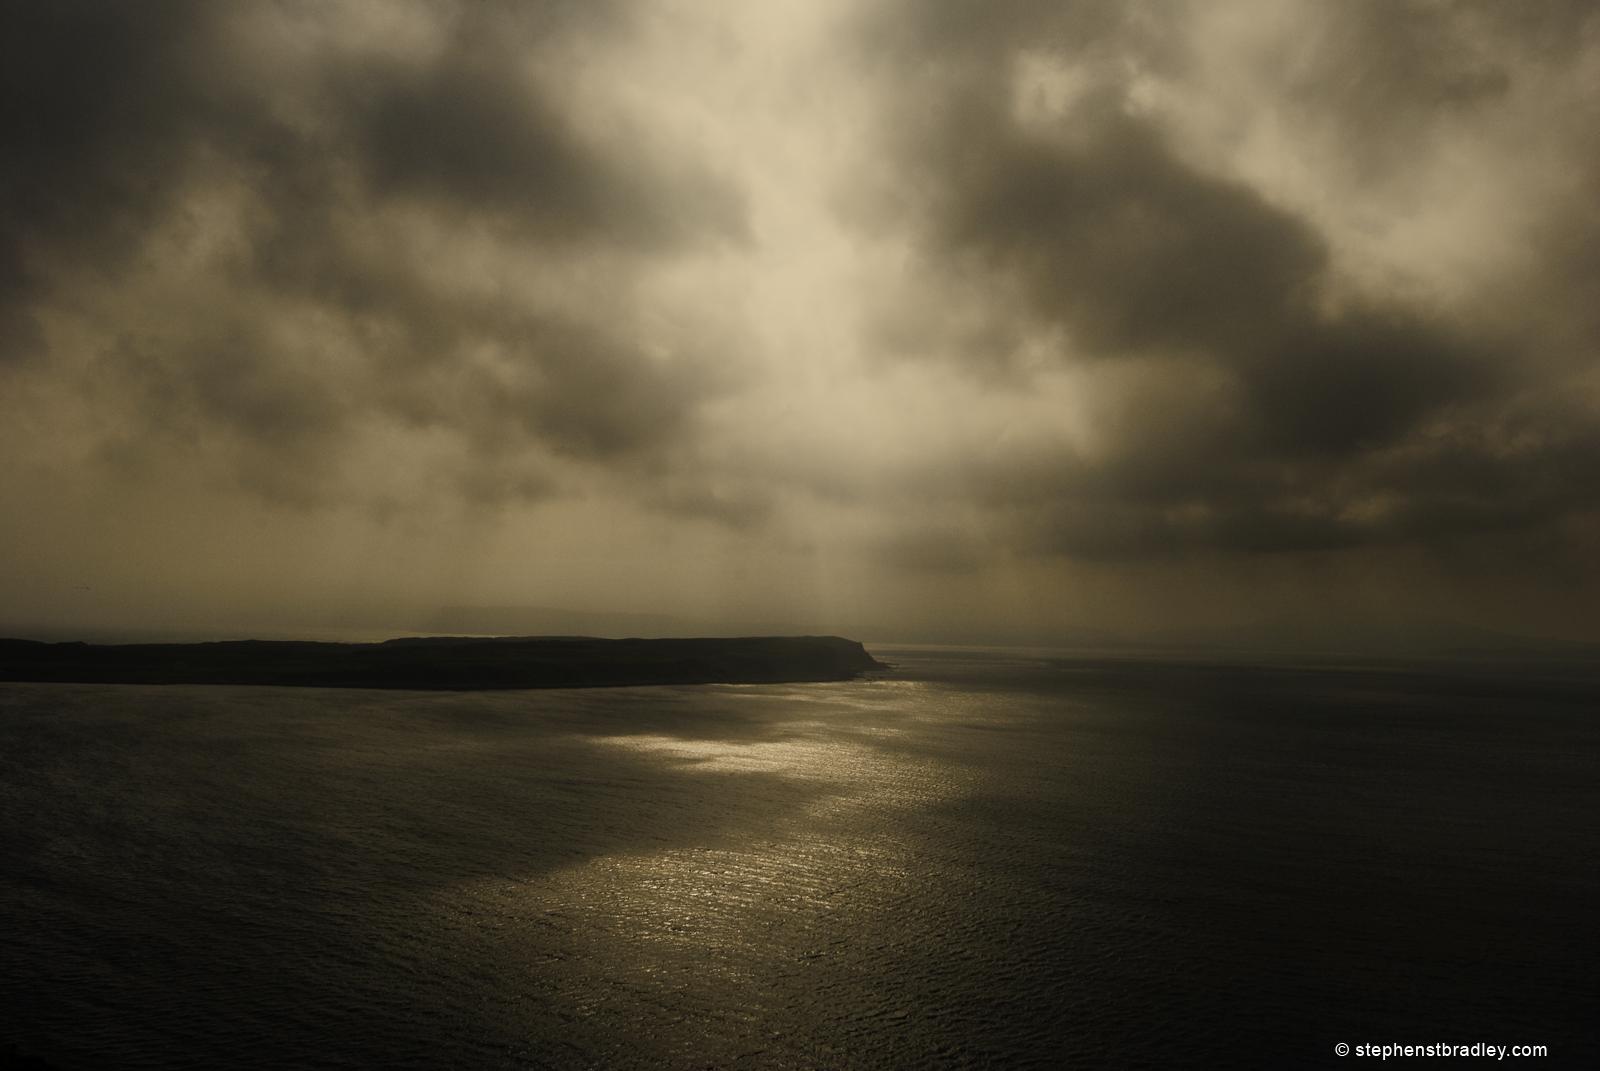 Rathlin Island south peninsula - Landscape photograph of Rathlin Island, Northern Ireland, UK. Image 4337